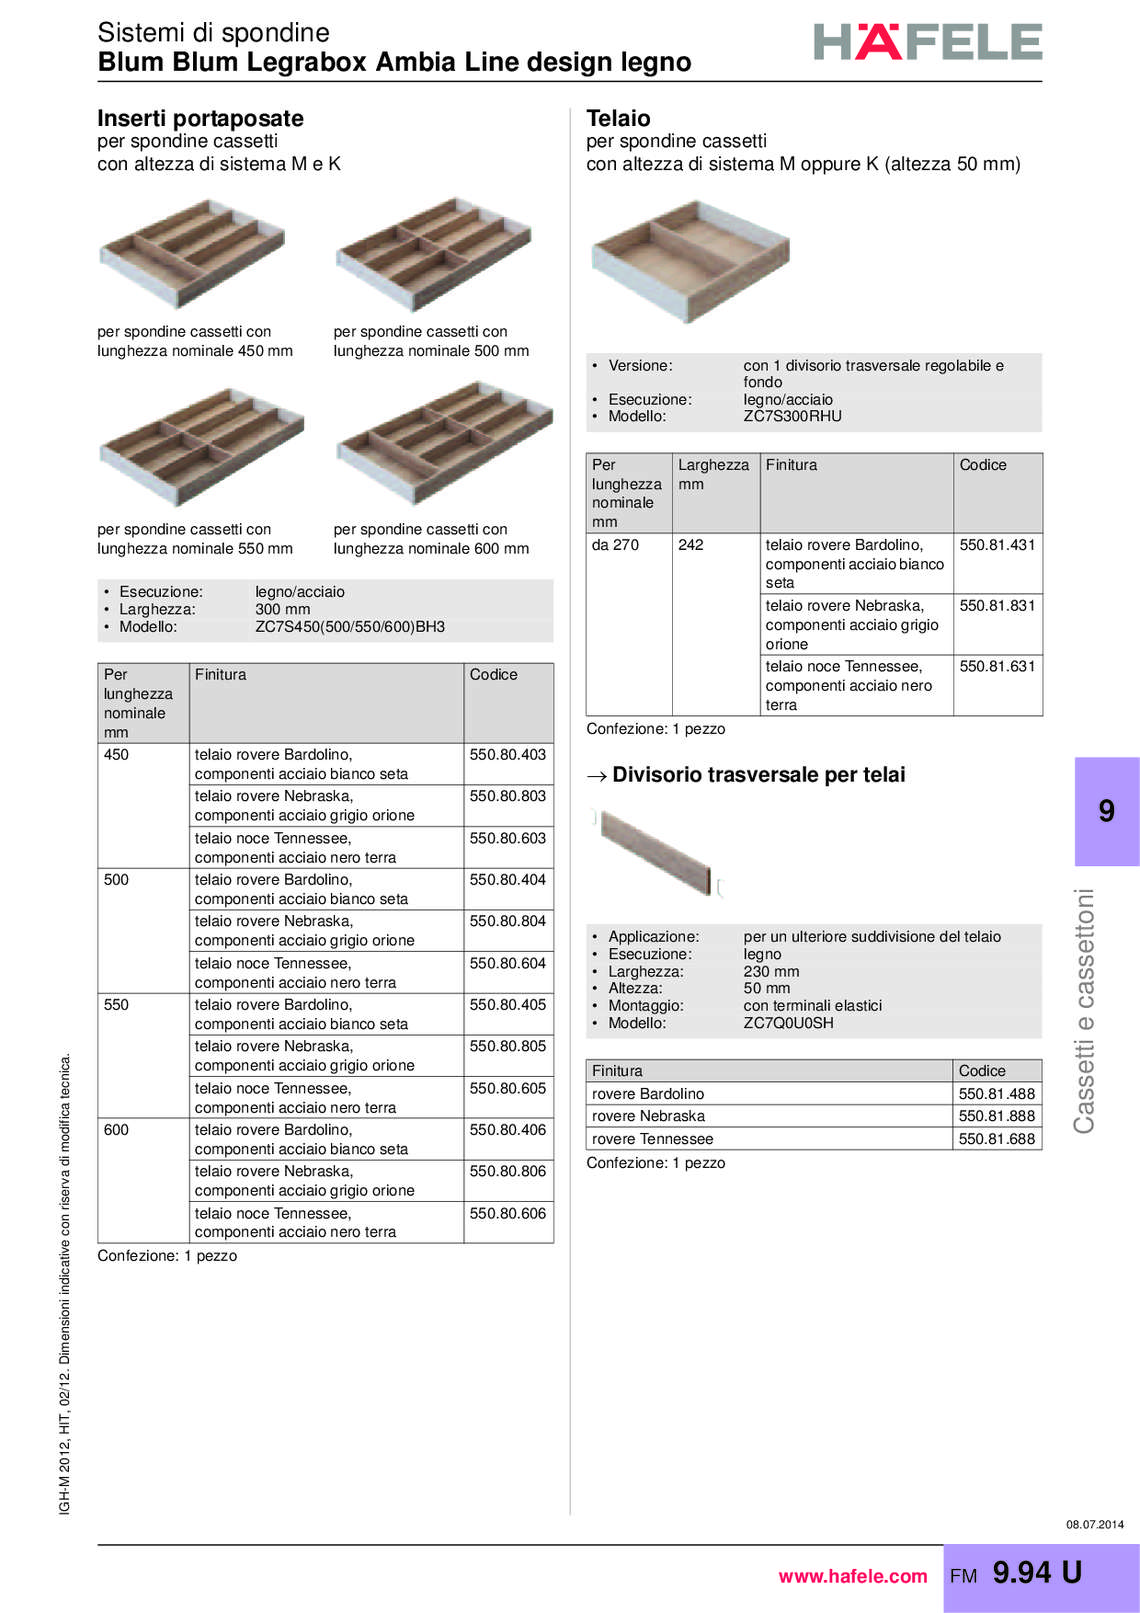 hafele-spondine-e-guide-per-mobili_40_138.jpg